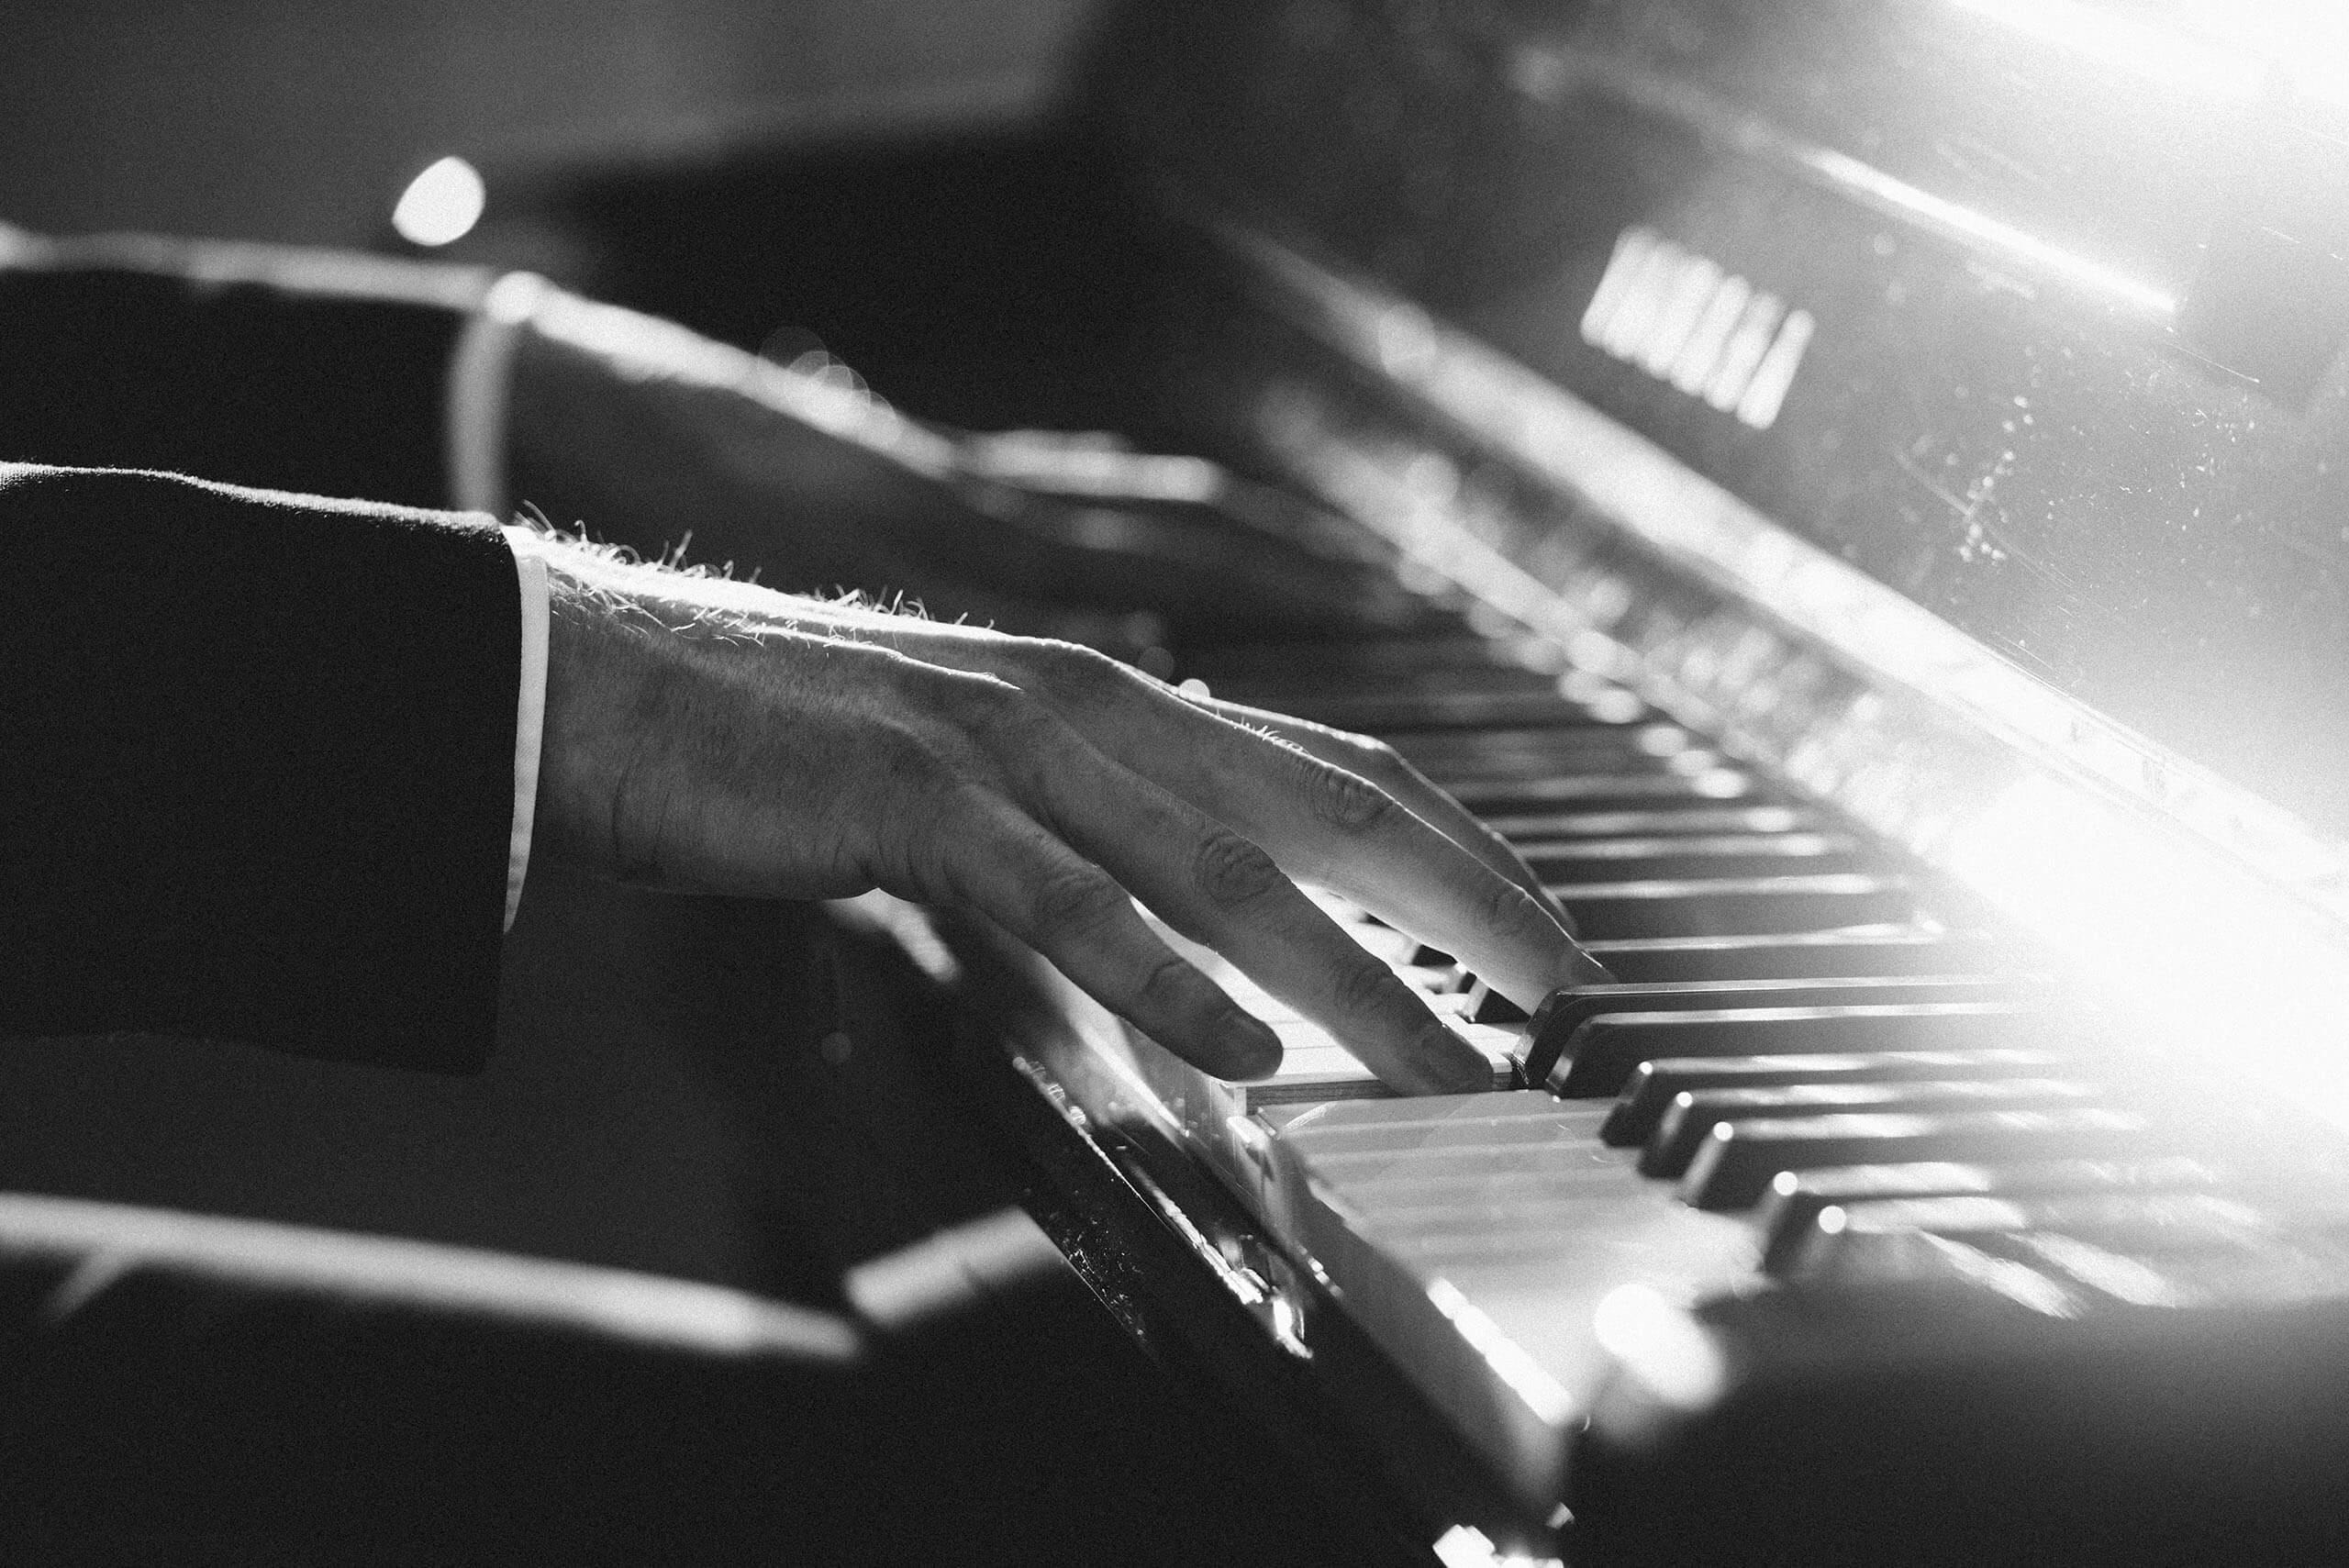 foto pianist handen yamaha piano